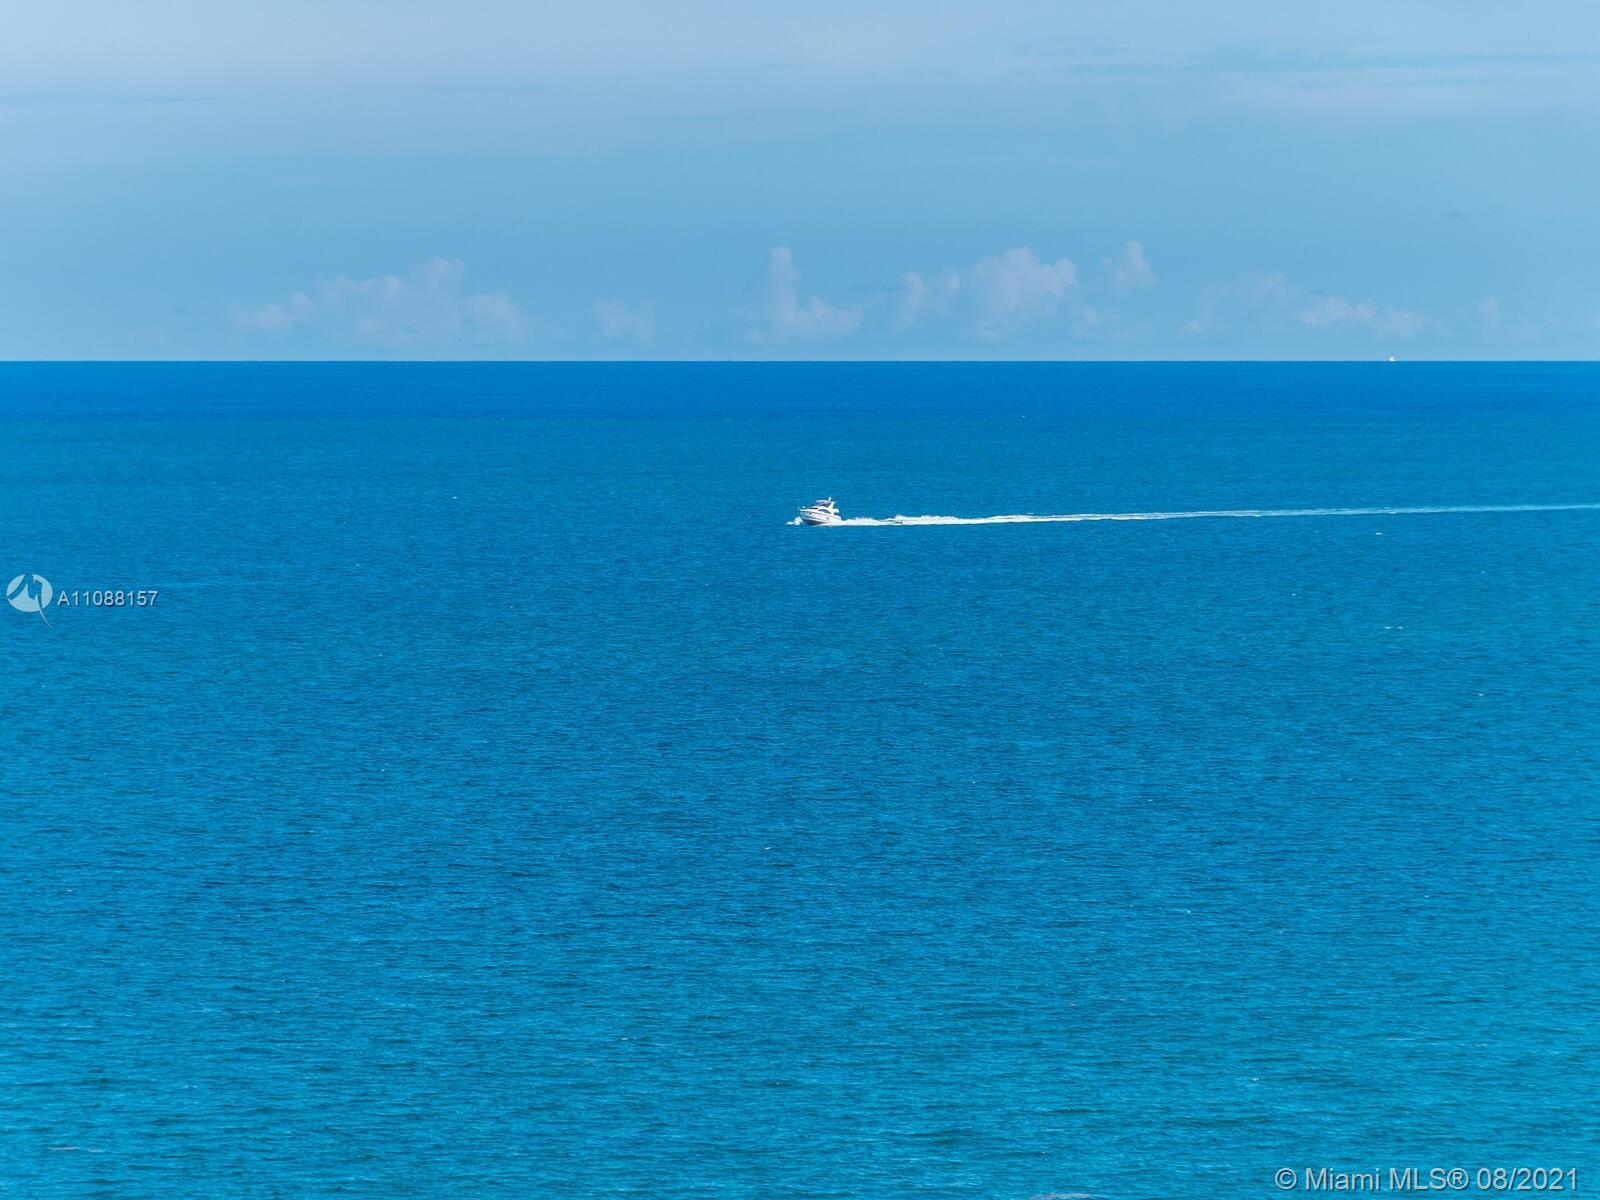 The Hemispheres One #17J - 1950 S Ocean Dr #17J, Hallandale Beach, FL 33009